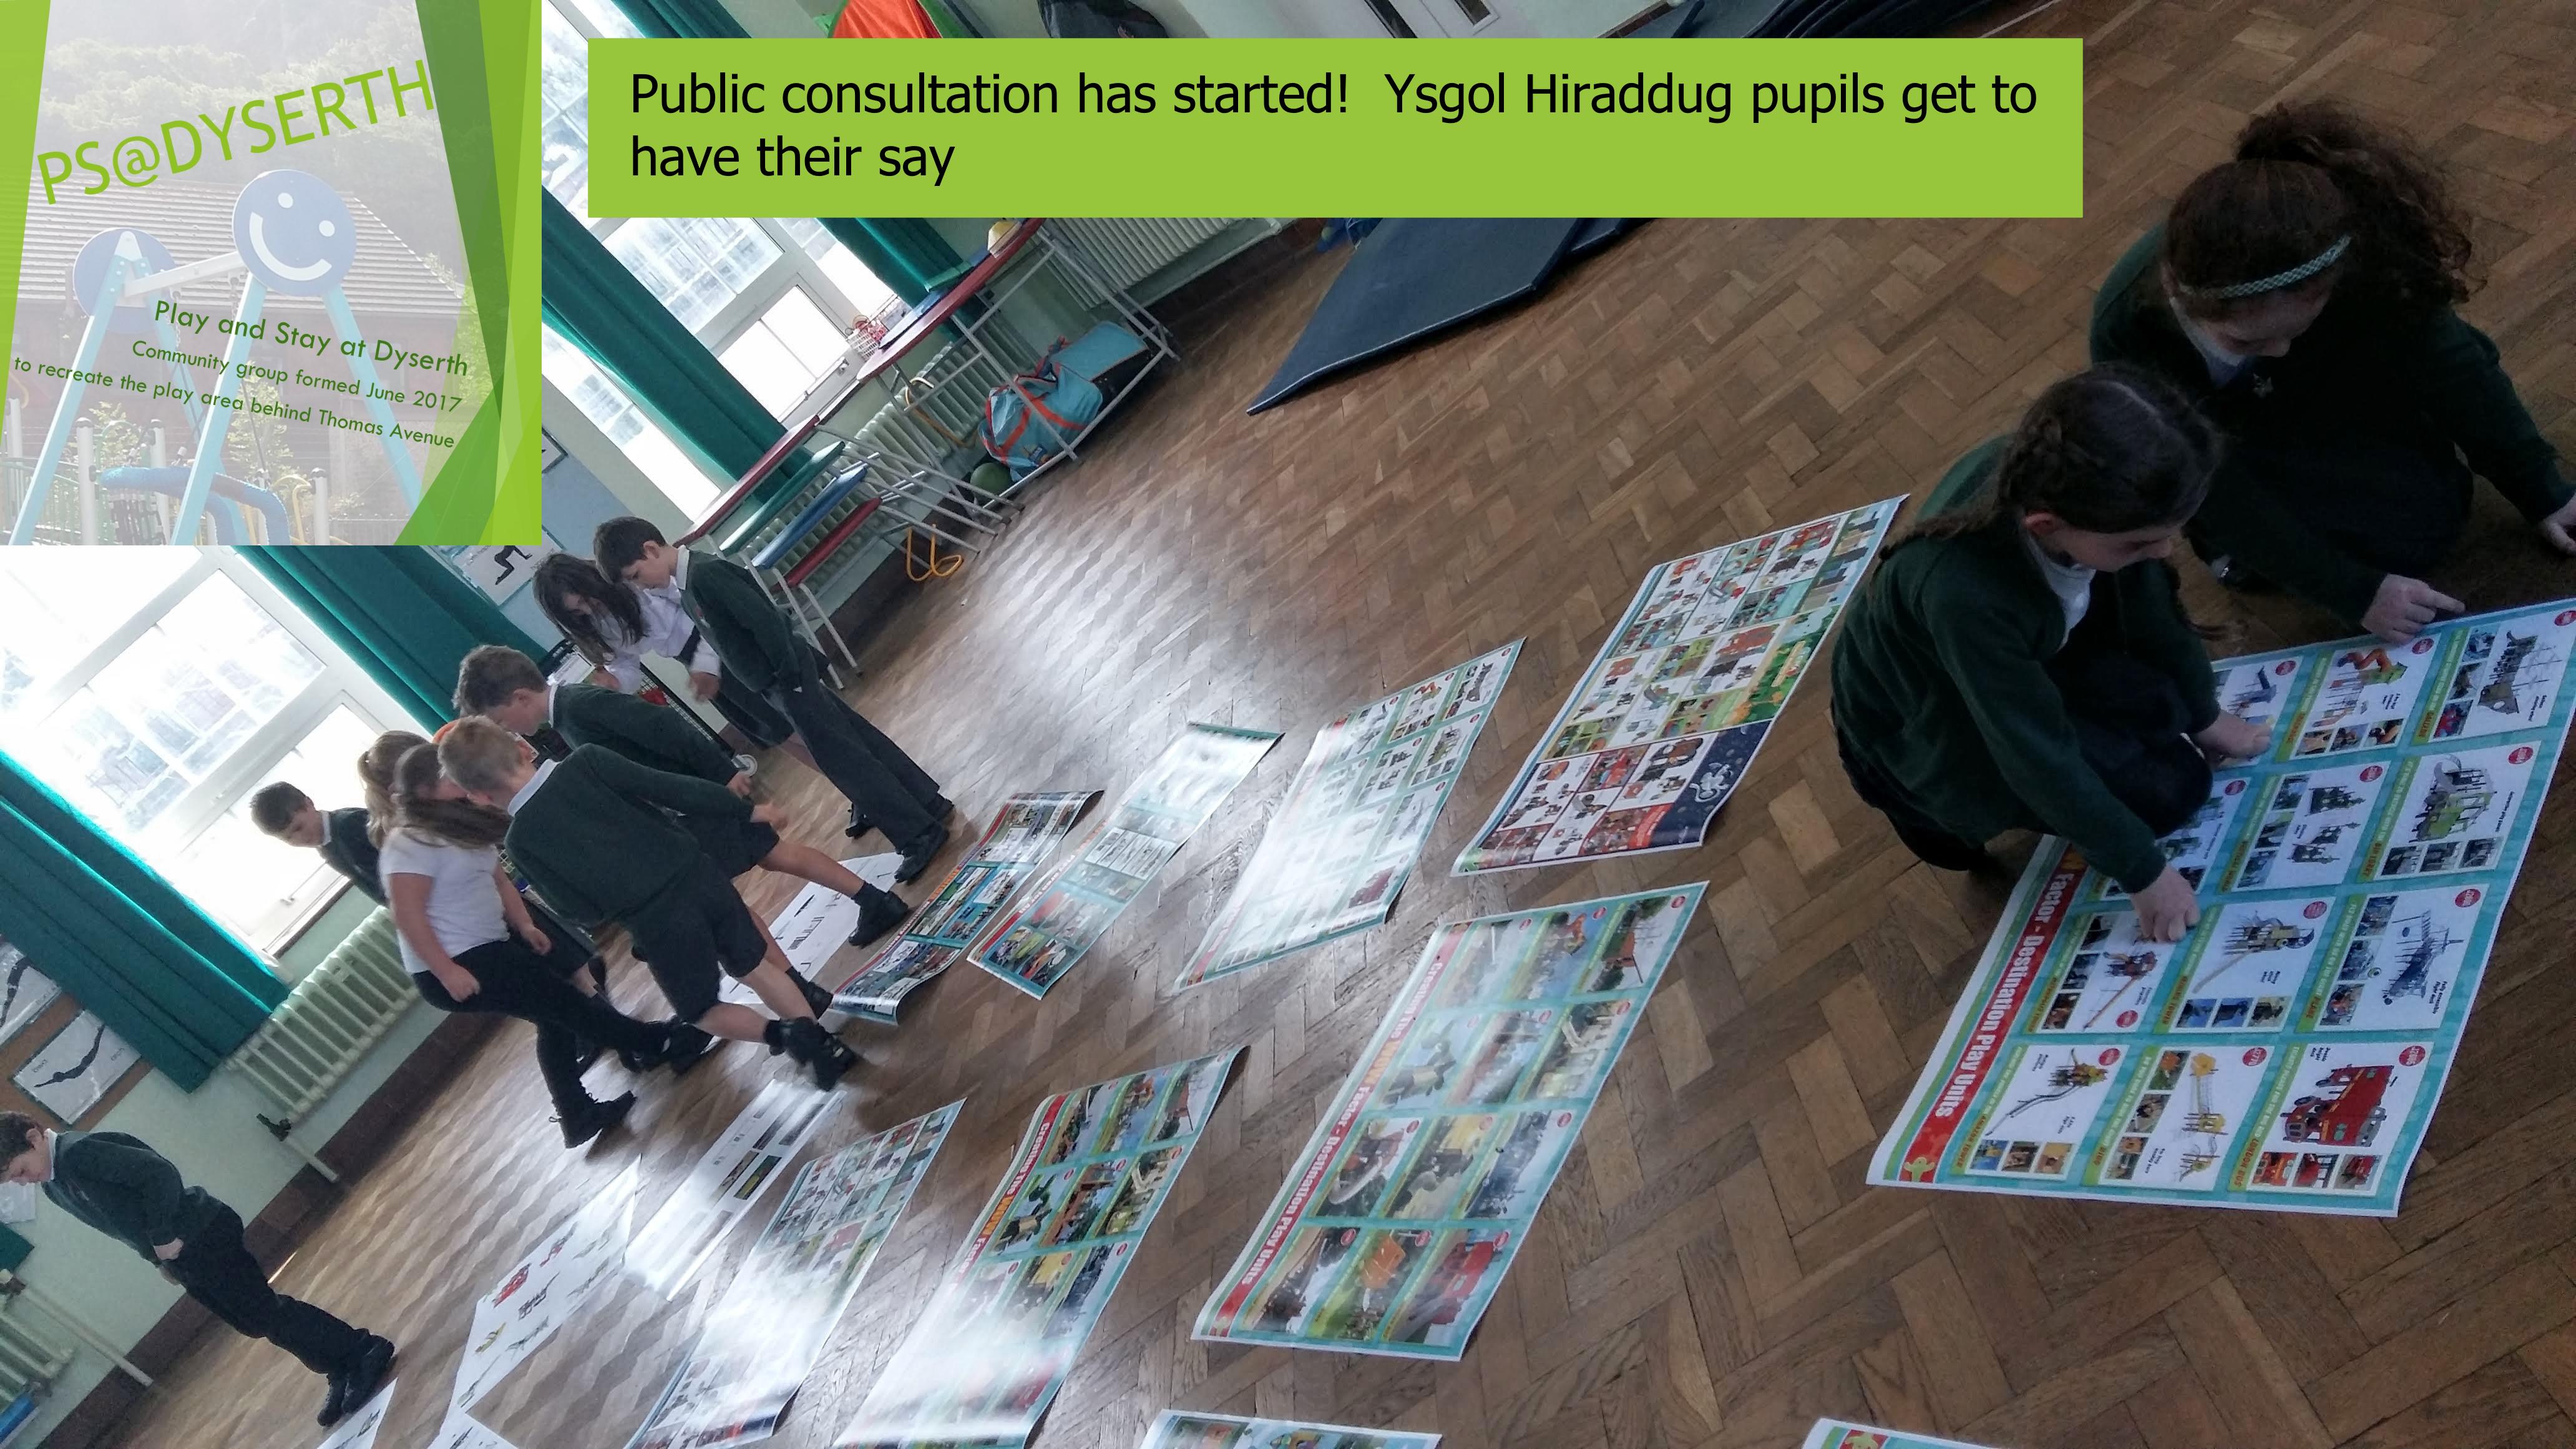 Public Consultation at Ysgol Hiraddug